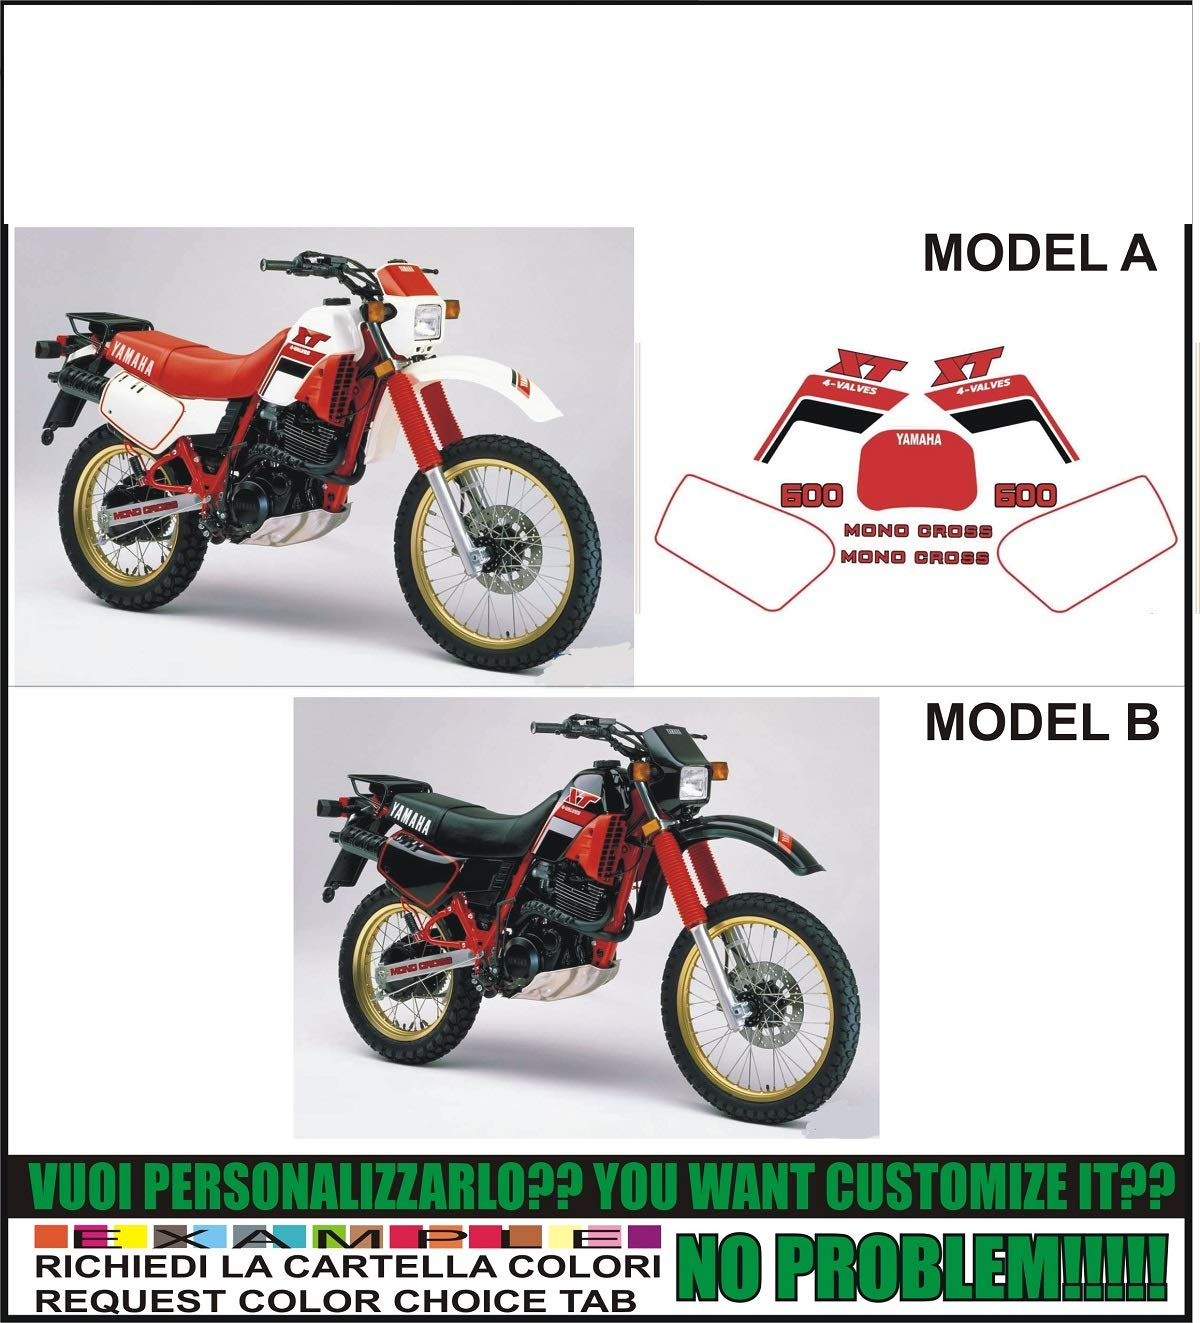 INDICARE IL MODELLO A o B Kit adesivi decal stikers yamaha XT 600 K 1986 43F